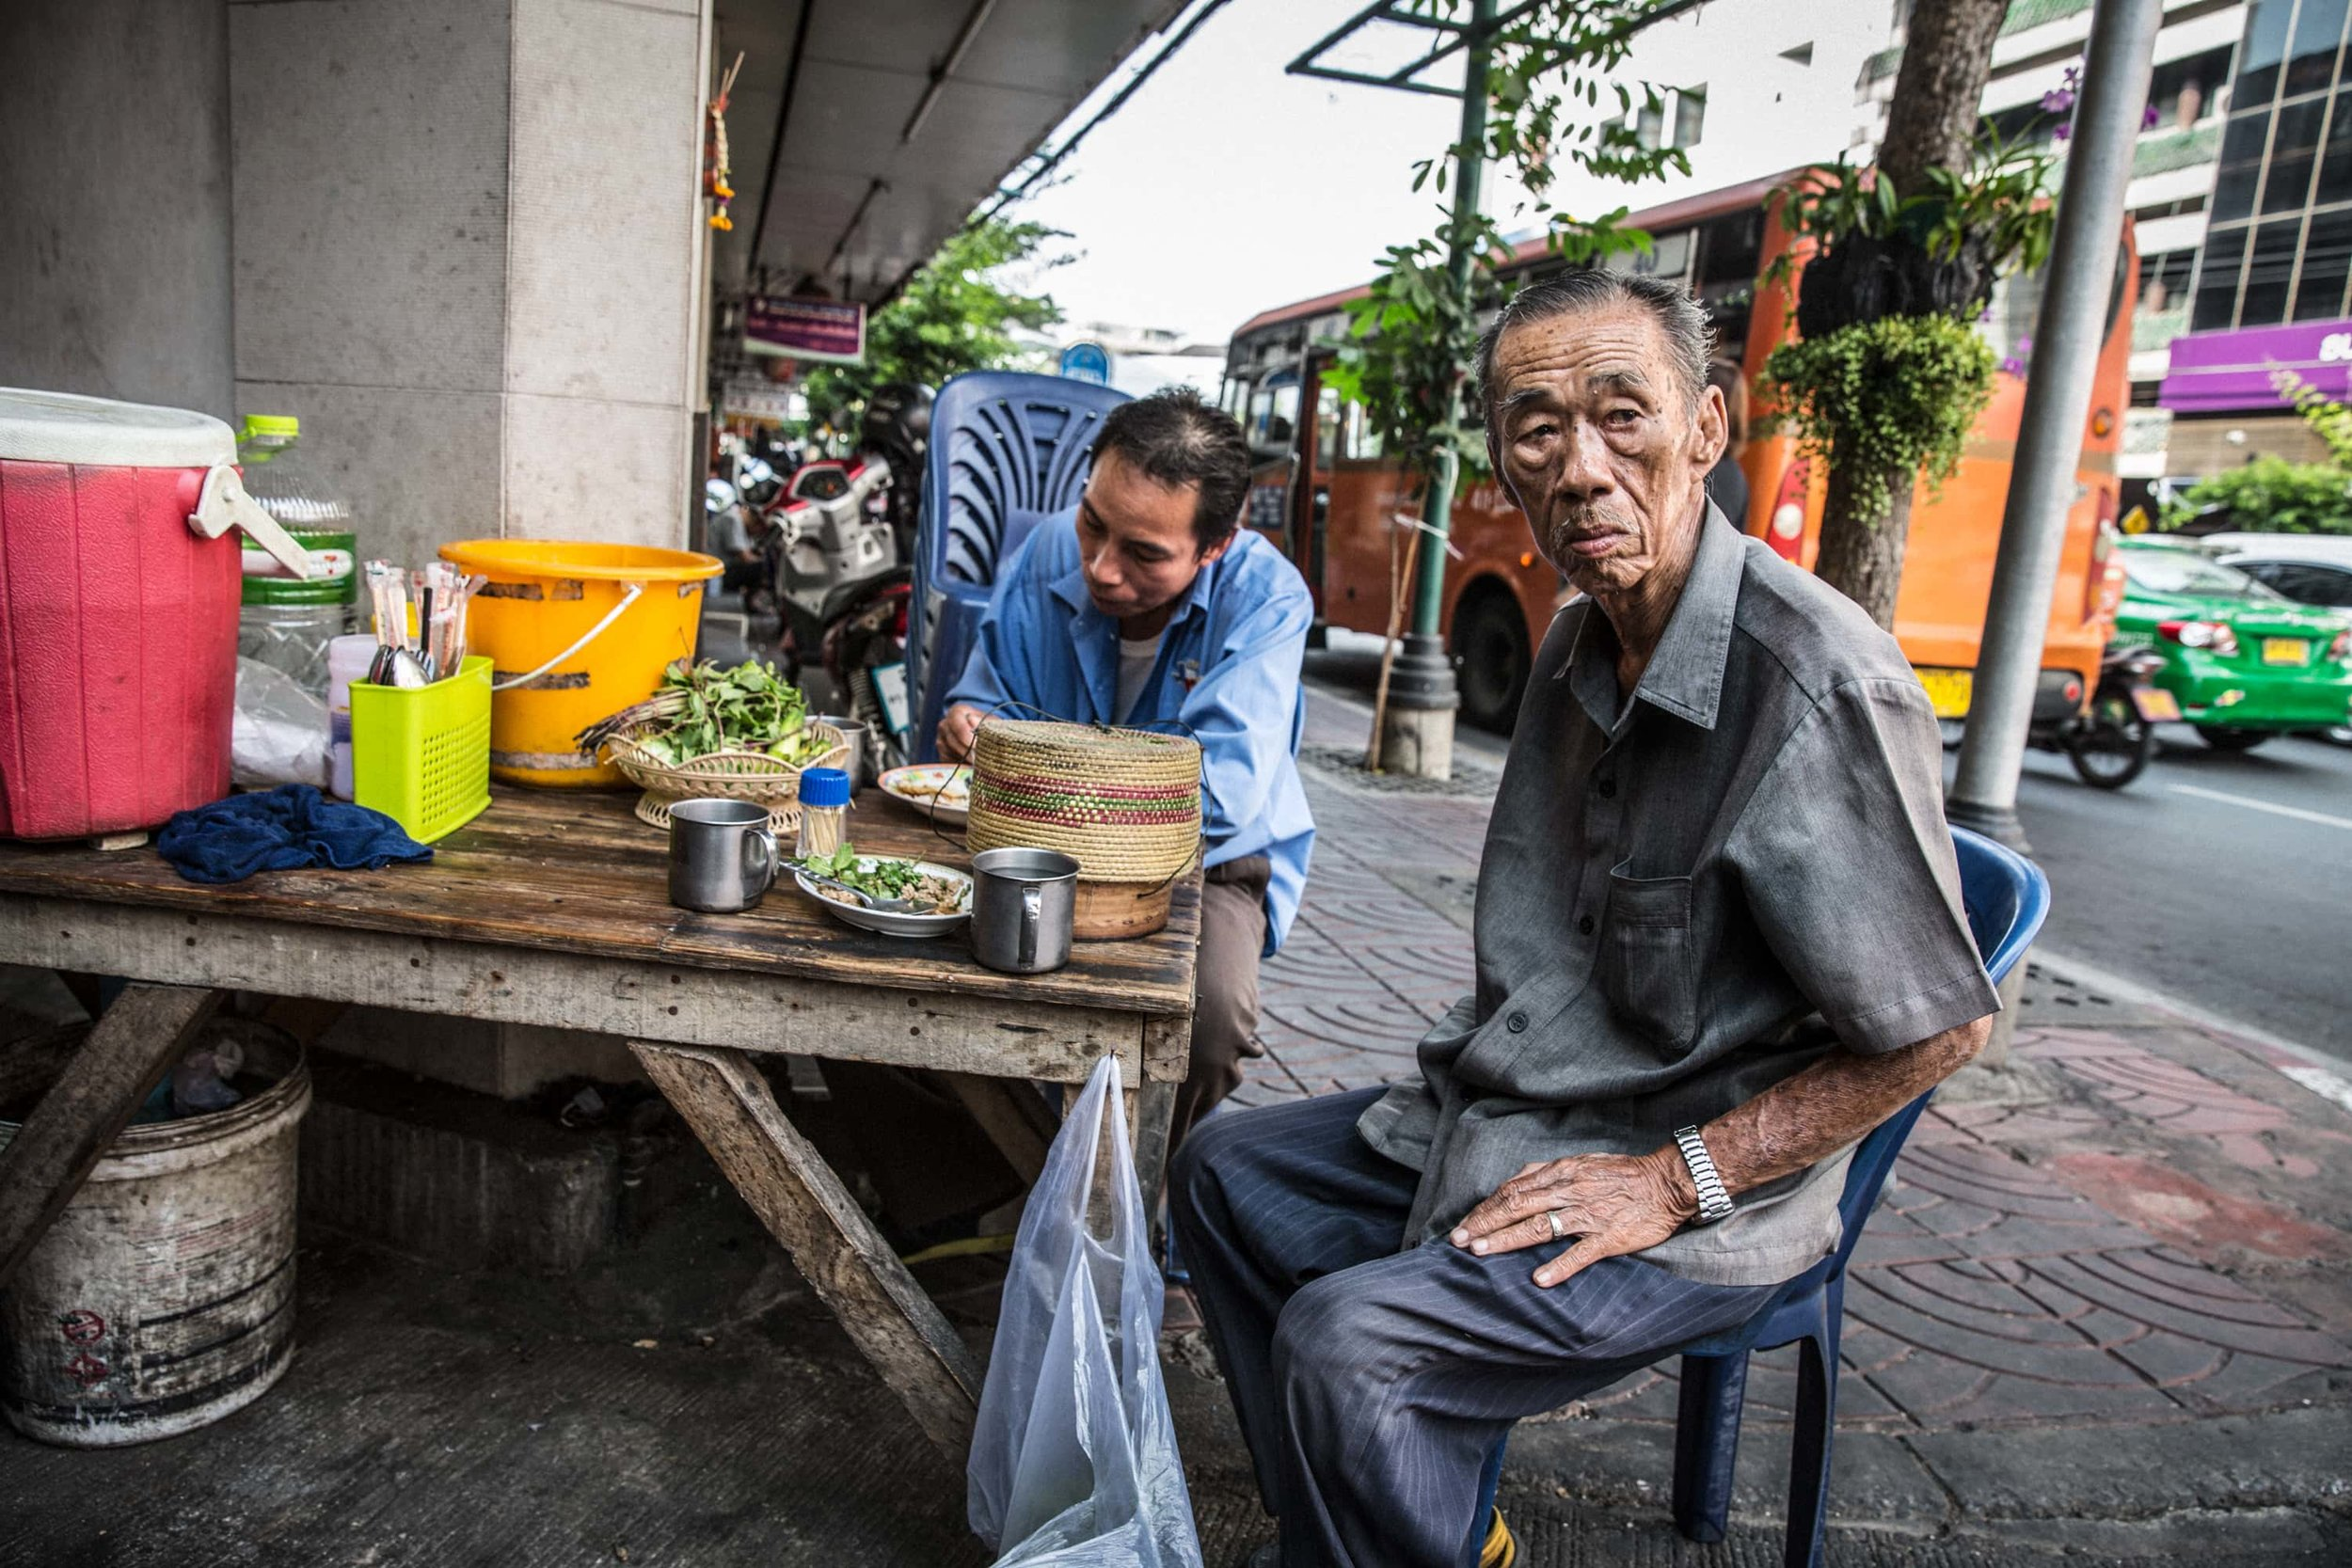 street-documentary-photography-fabio-burrelli-26.jpg